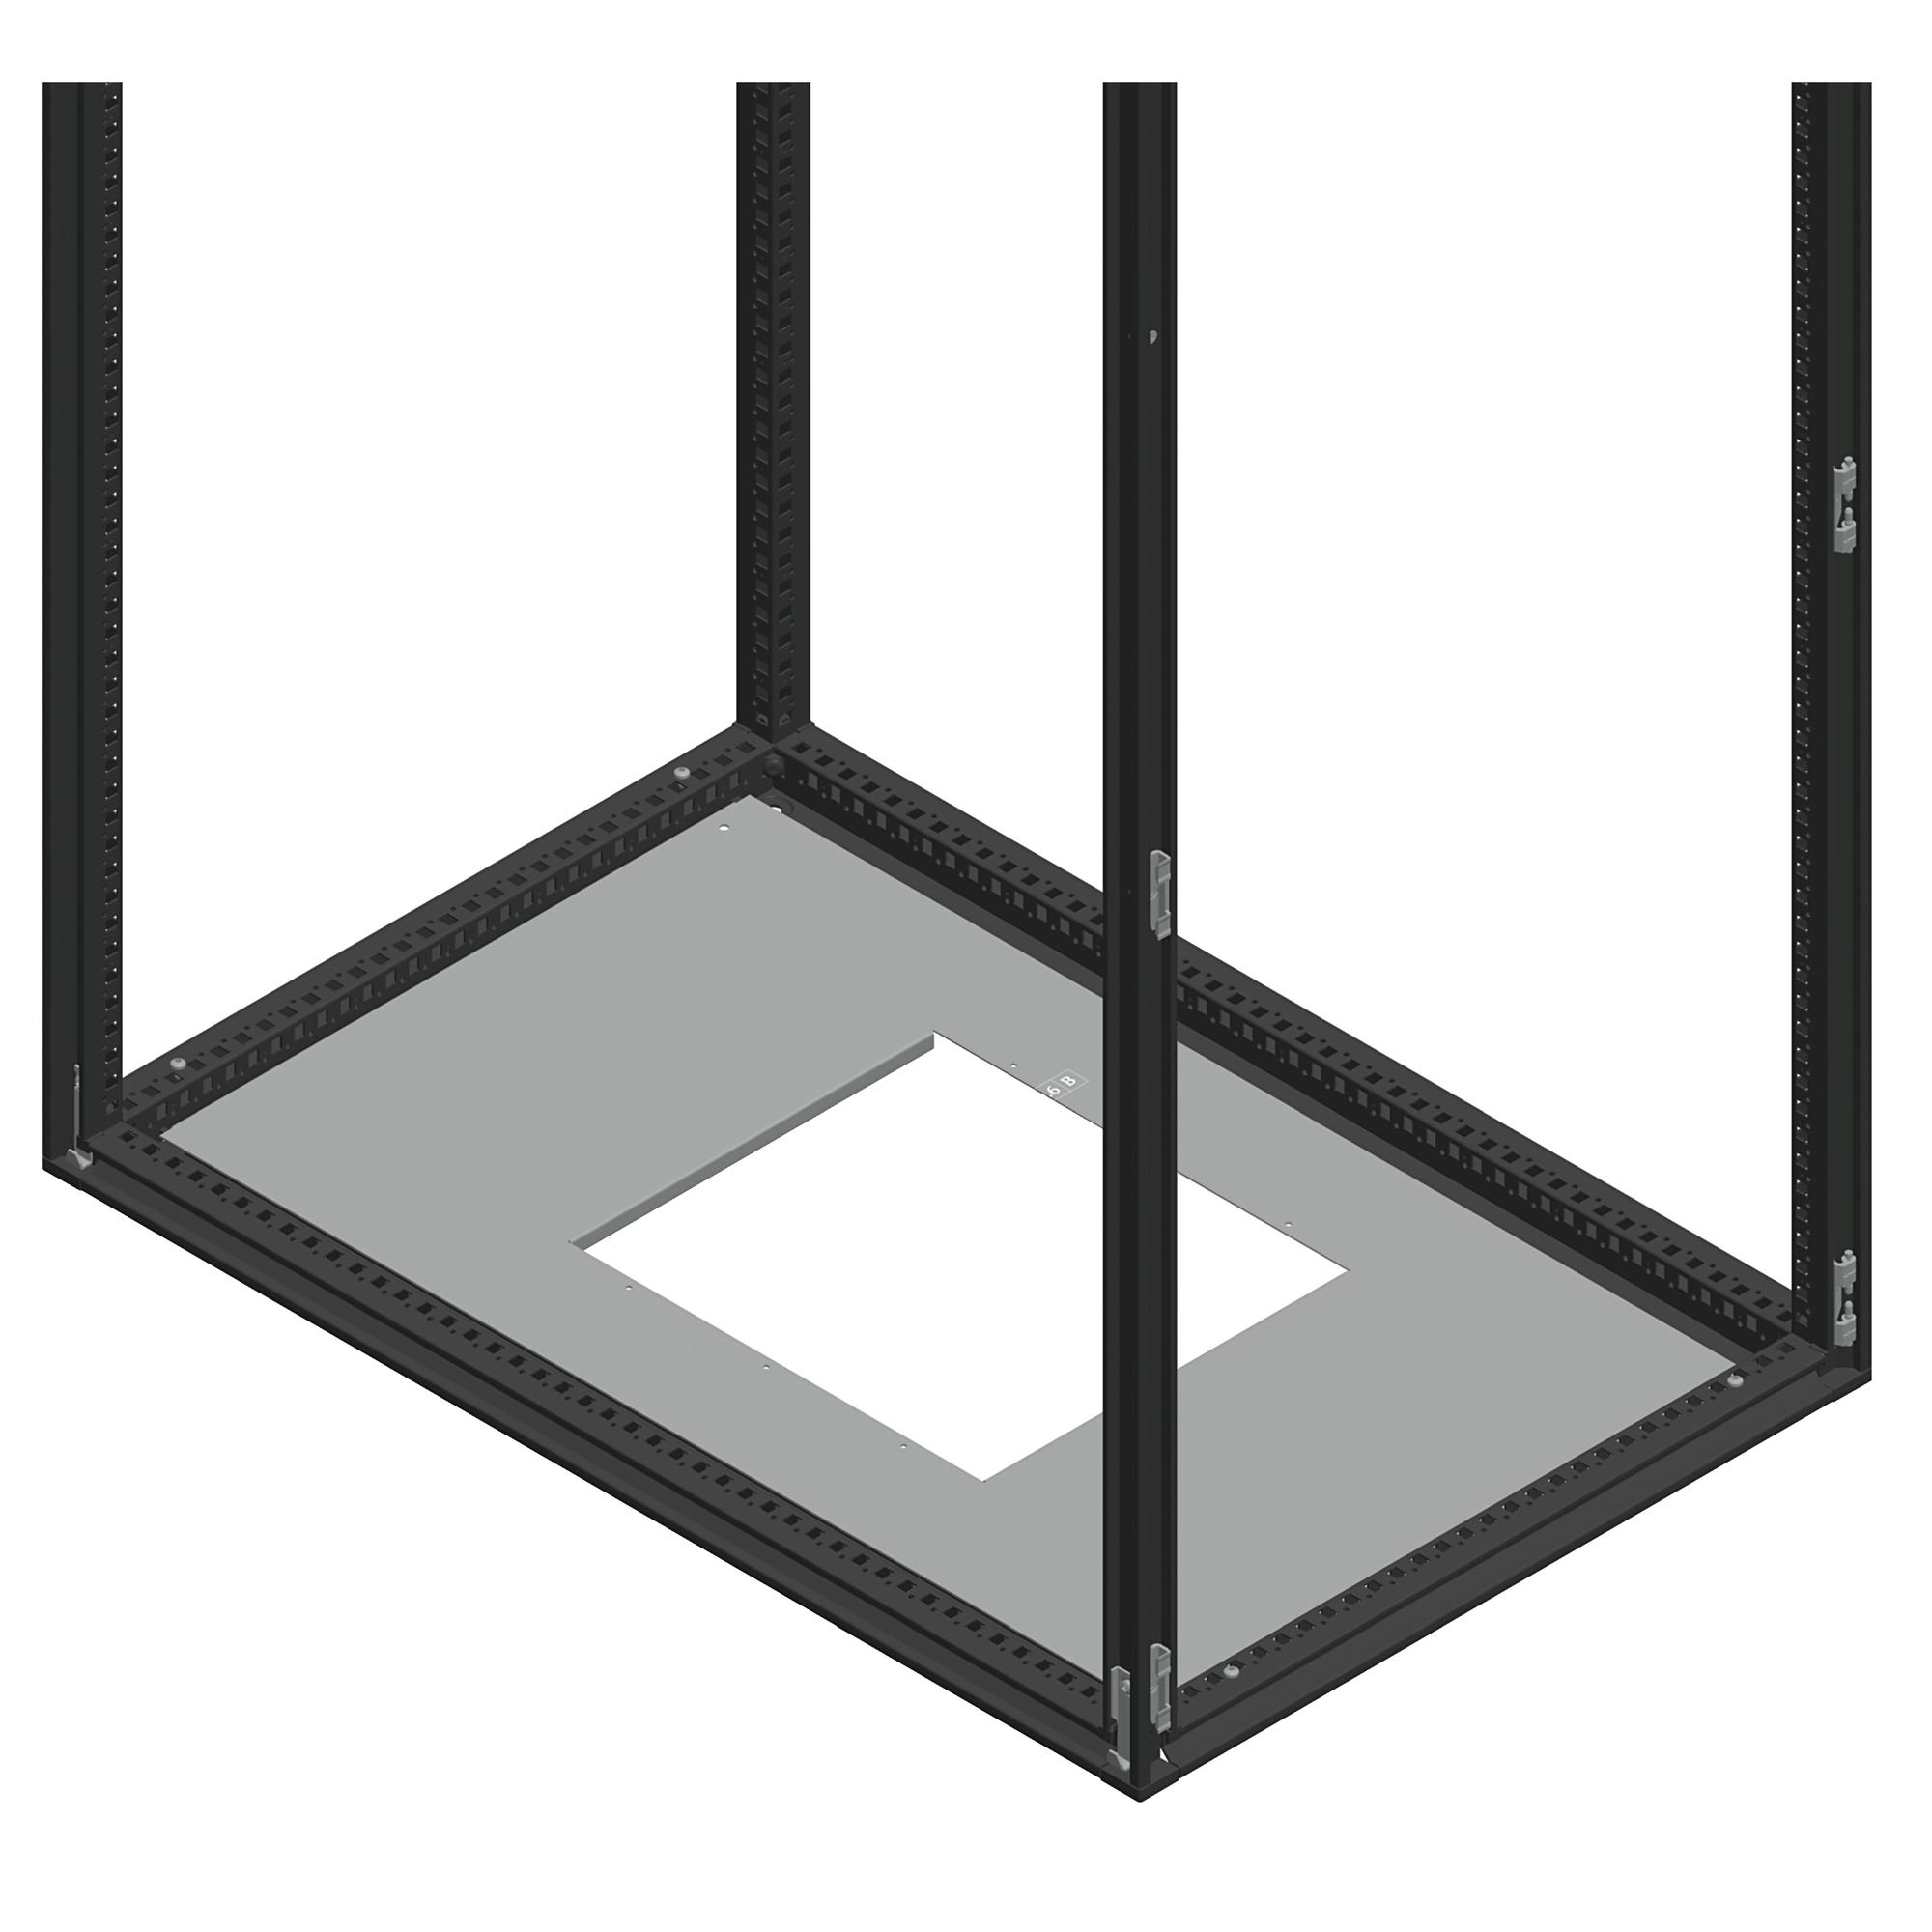 Image Description for https://tedi.itc-electronics.com/itcmedia/images/20190424/KZ/__7.jpeg